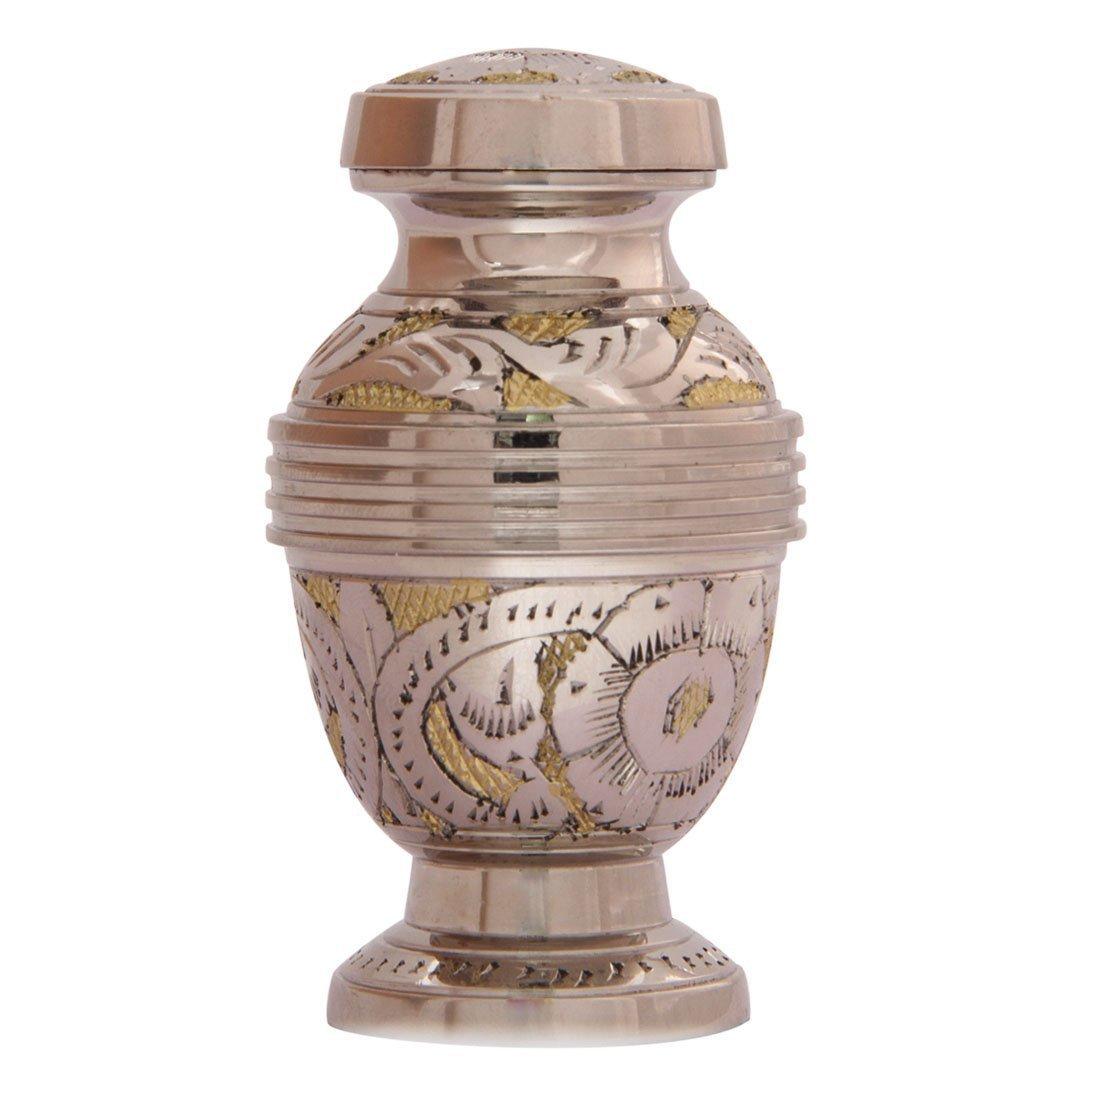 Silver Flower Engraved Golden Keepsake Urn Small